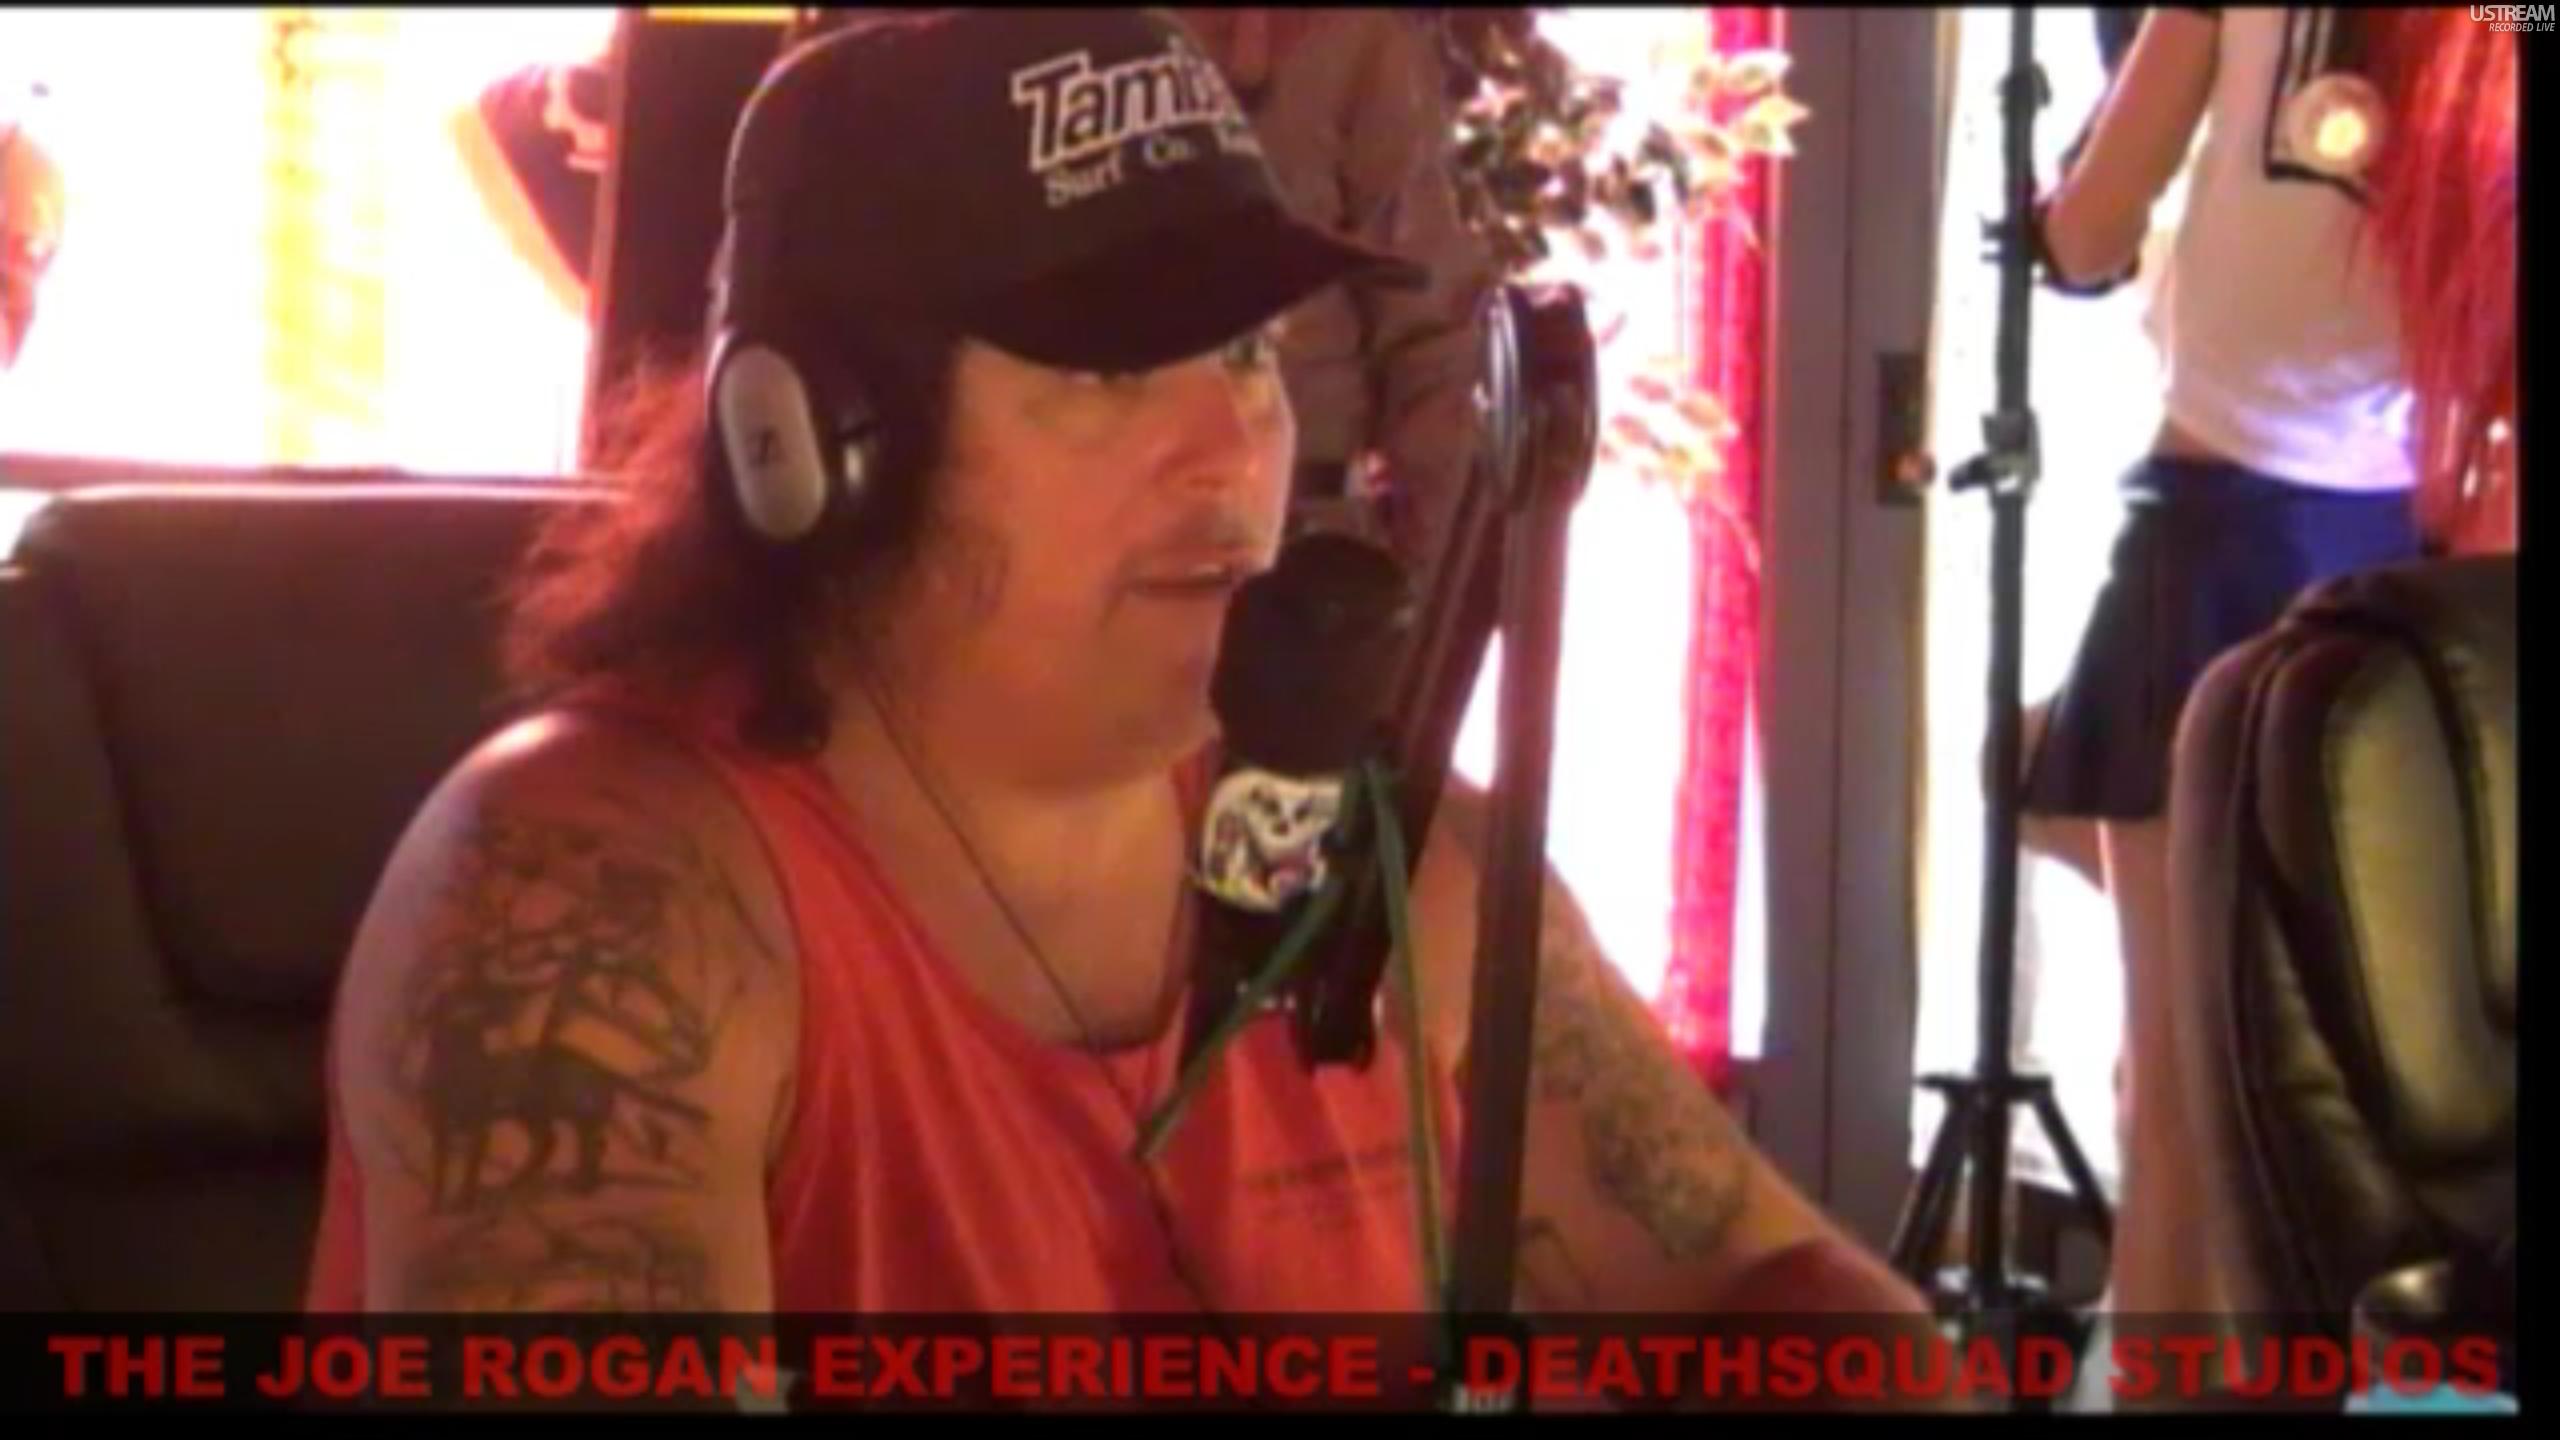 The Joe Rogan Experience #241 - James Bobo Fay, Brian Redban